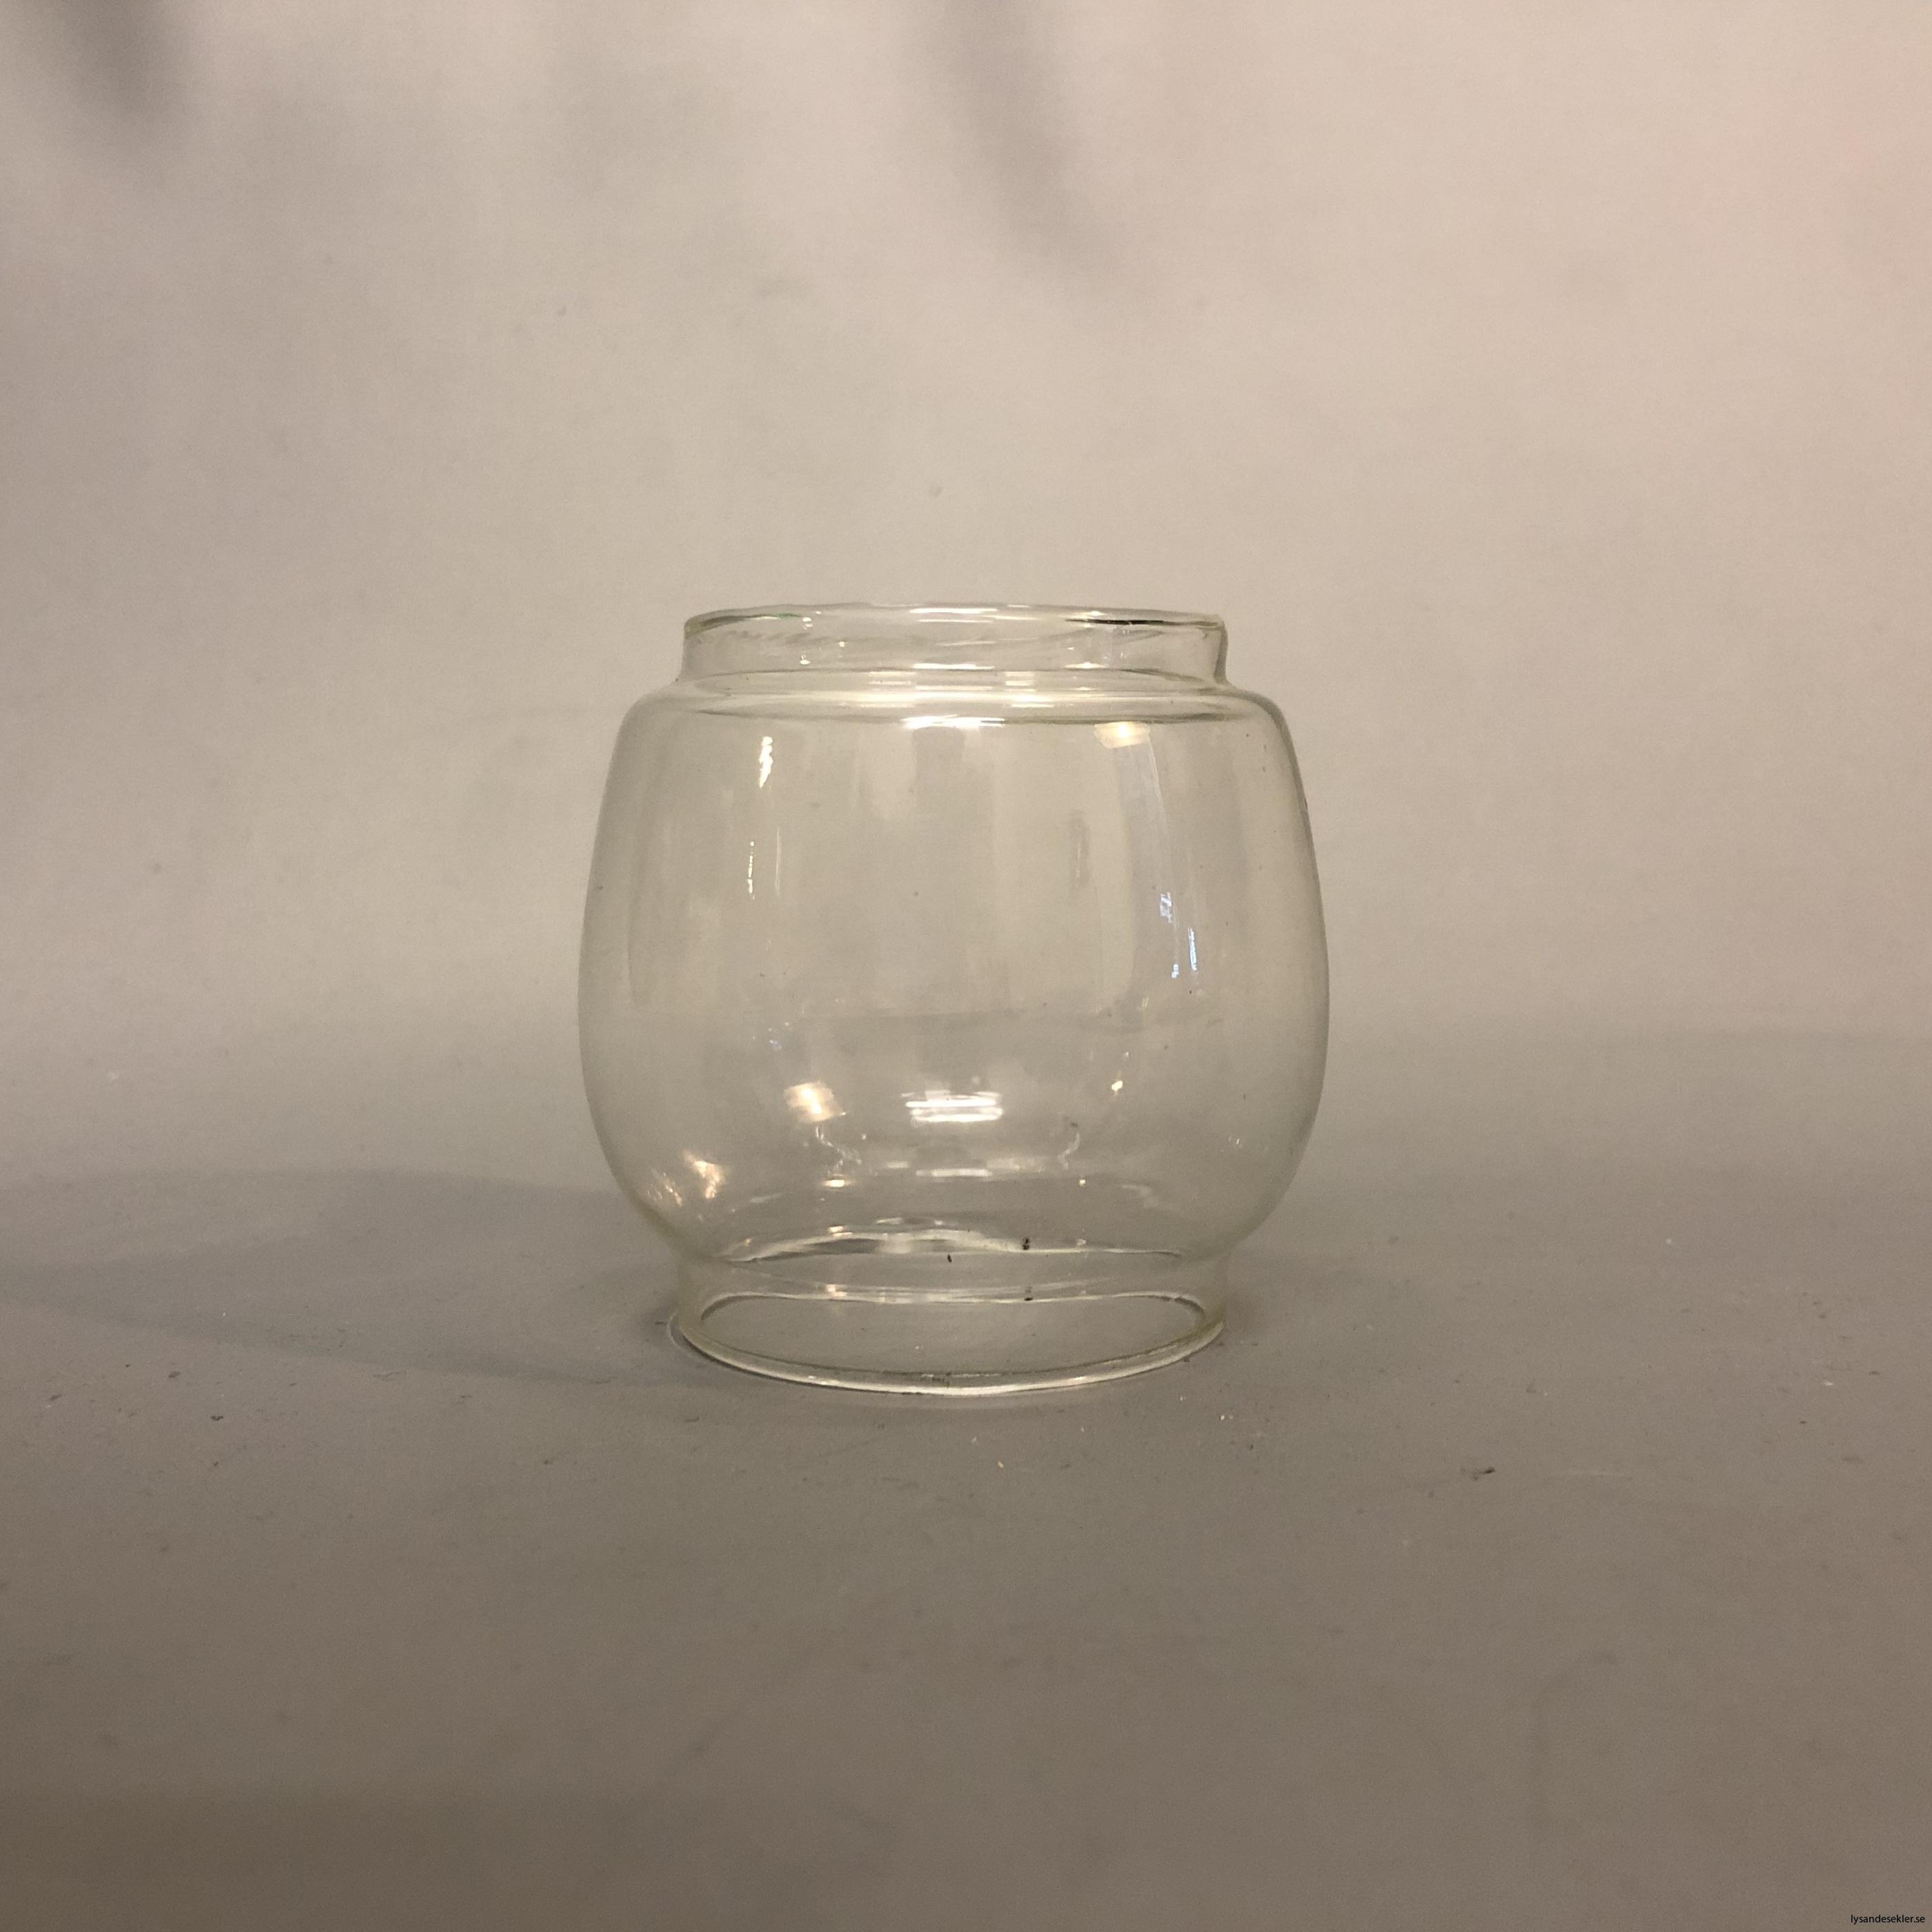 glas till liten stormlykta 47x49x63 mm